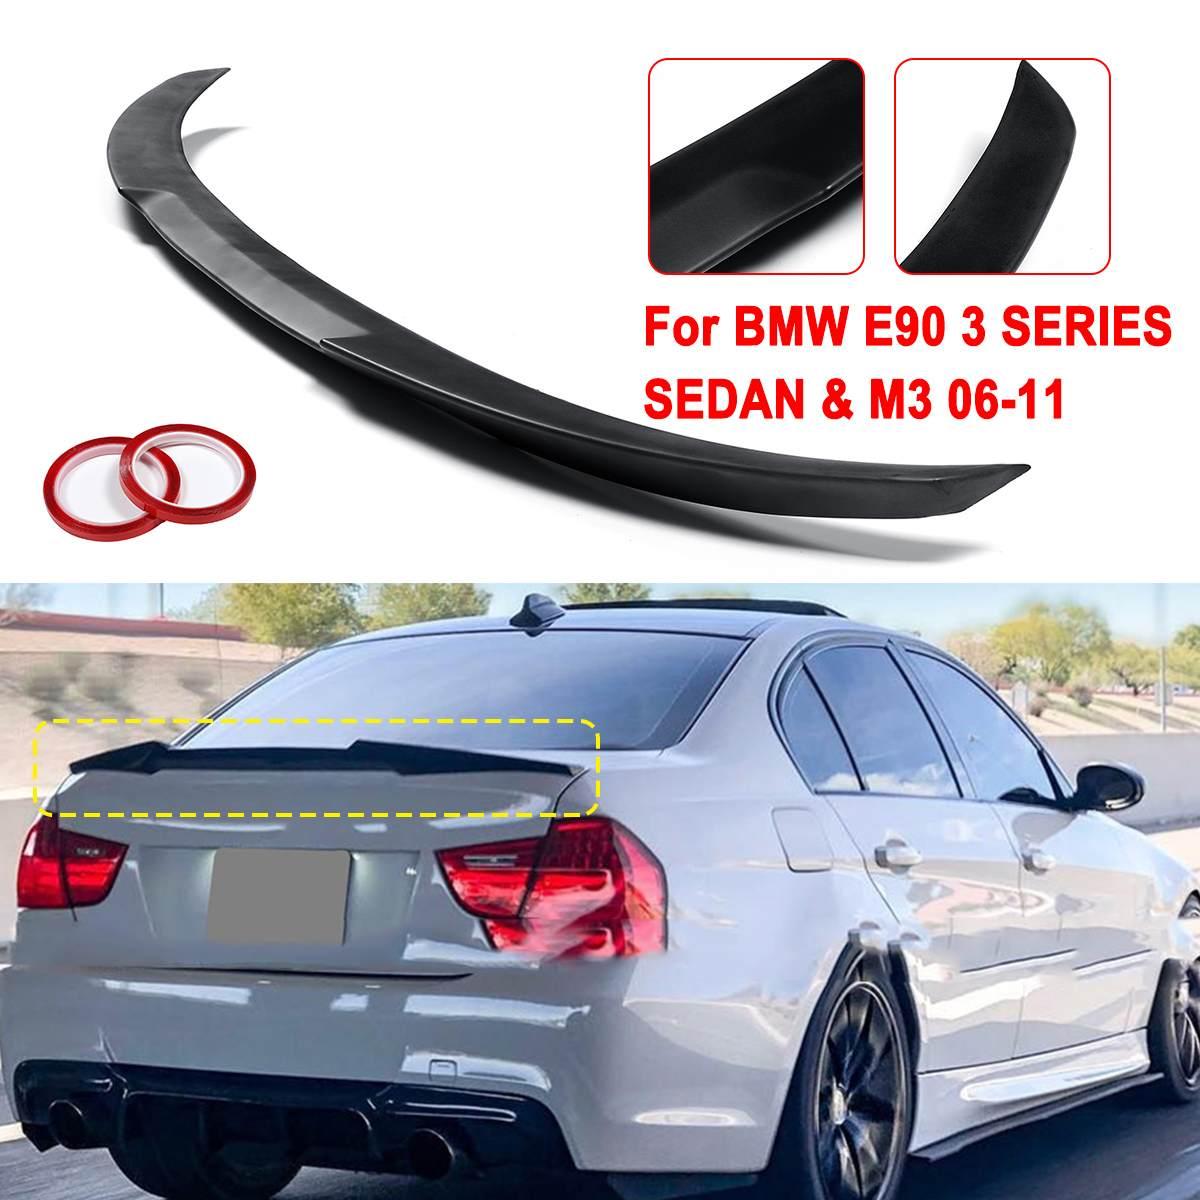 Matte/Glossy Black/คาร์บอนไฟเบอร์ ABS สปอยเลอร์ปีก M4-STYLE สำหรับ 2006-2011 สำหรับ BMW E90 3 SERIES ซีดาน & M3 2008-2012